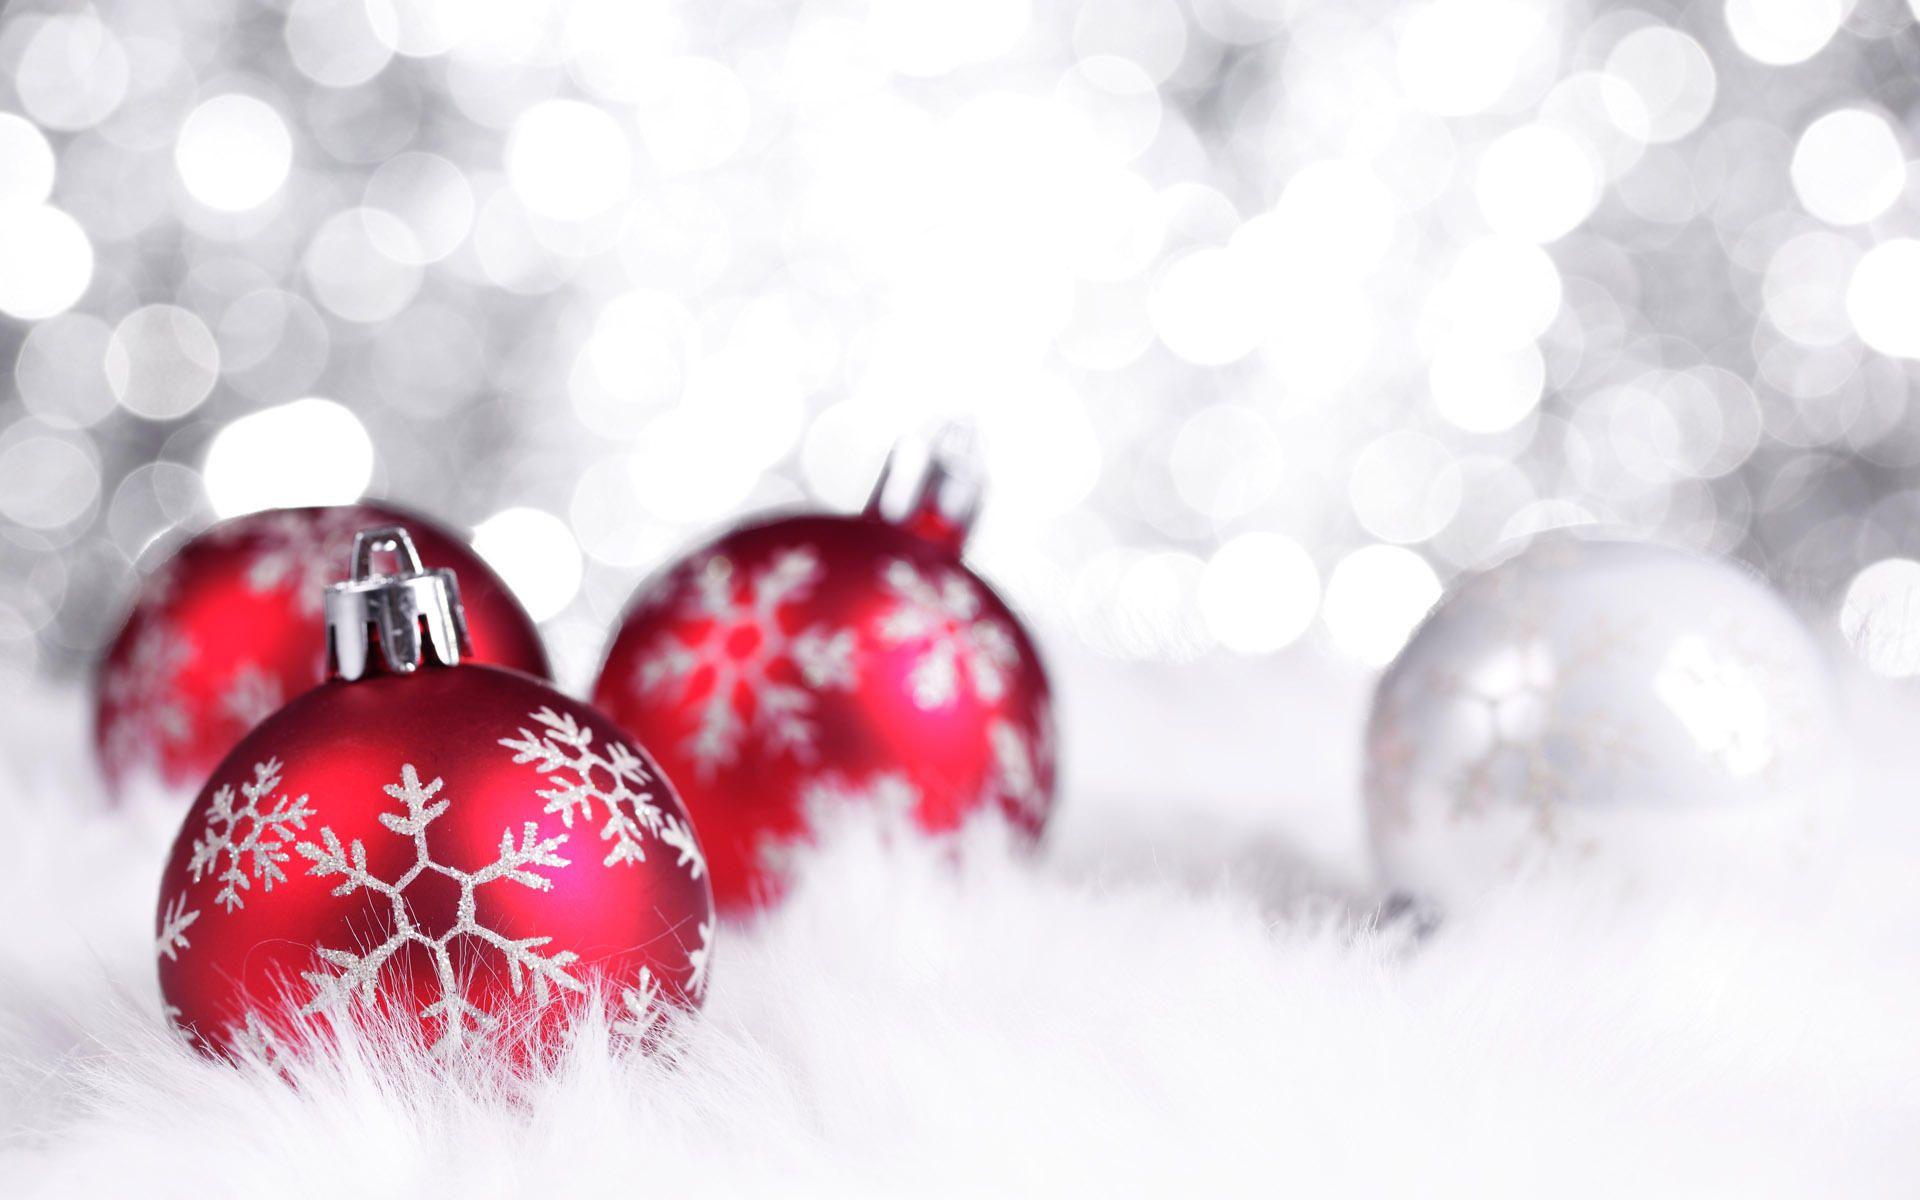 Christmas Red Christmas Ornaments Christmas Wallpaper Hd Xmas Wallpaper